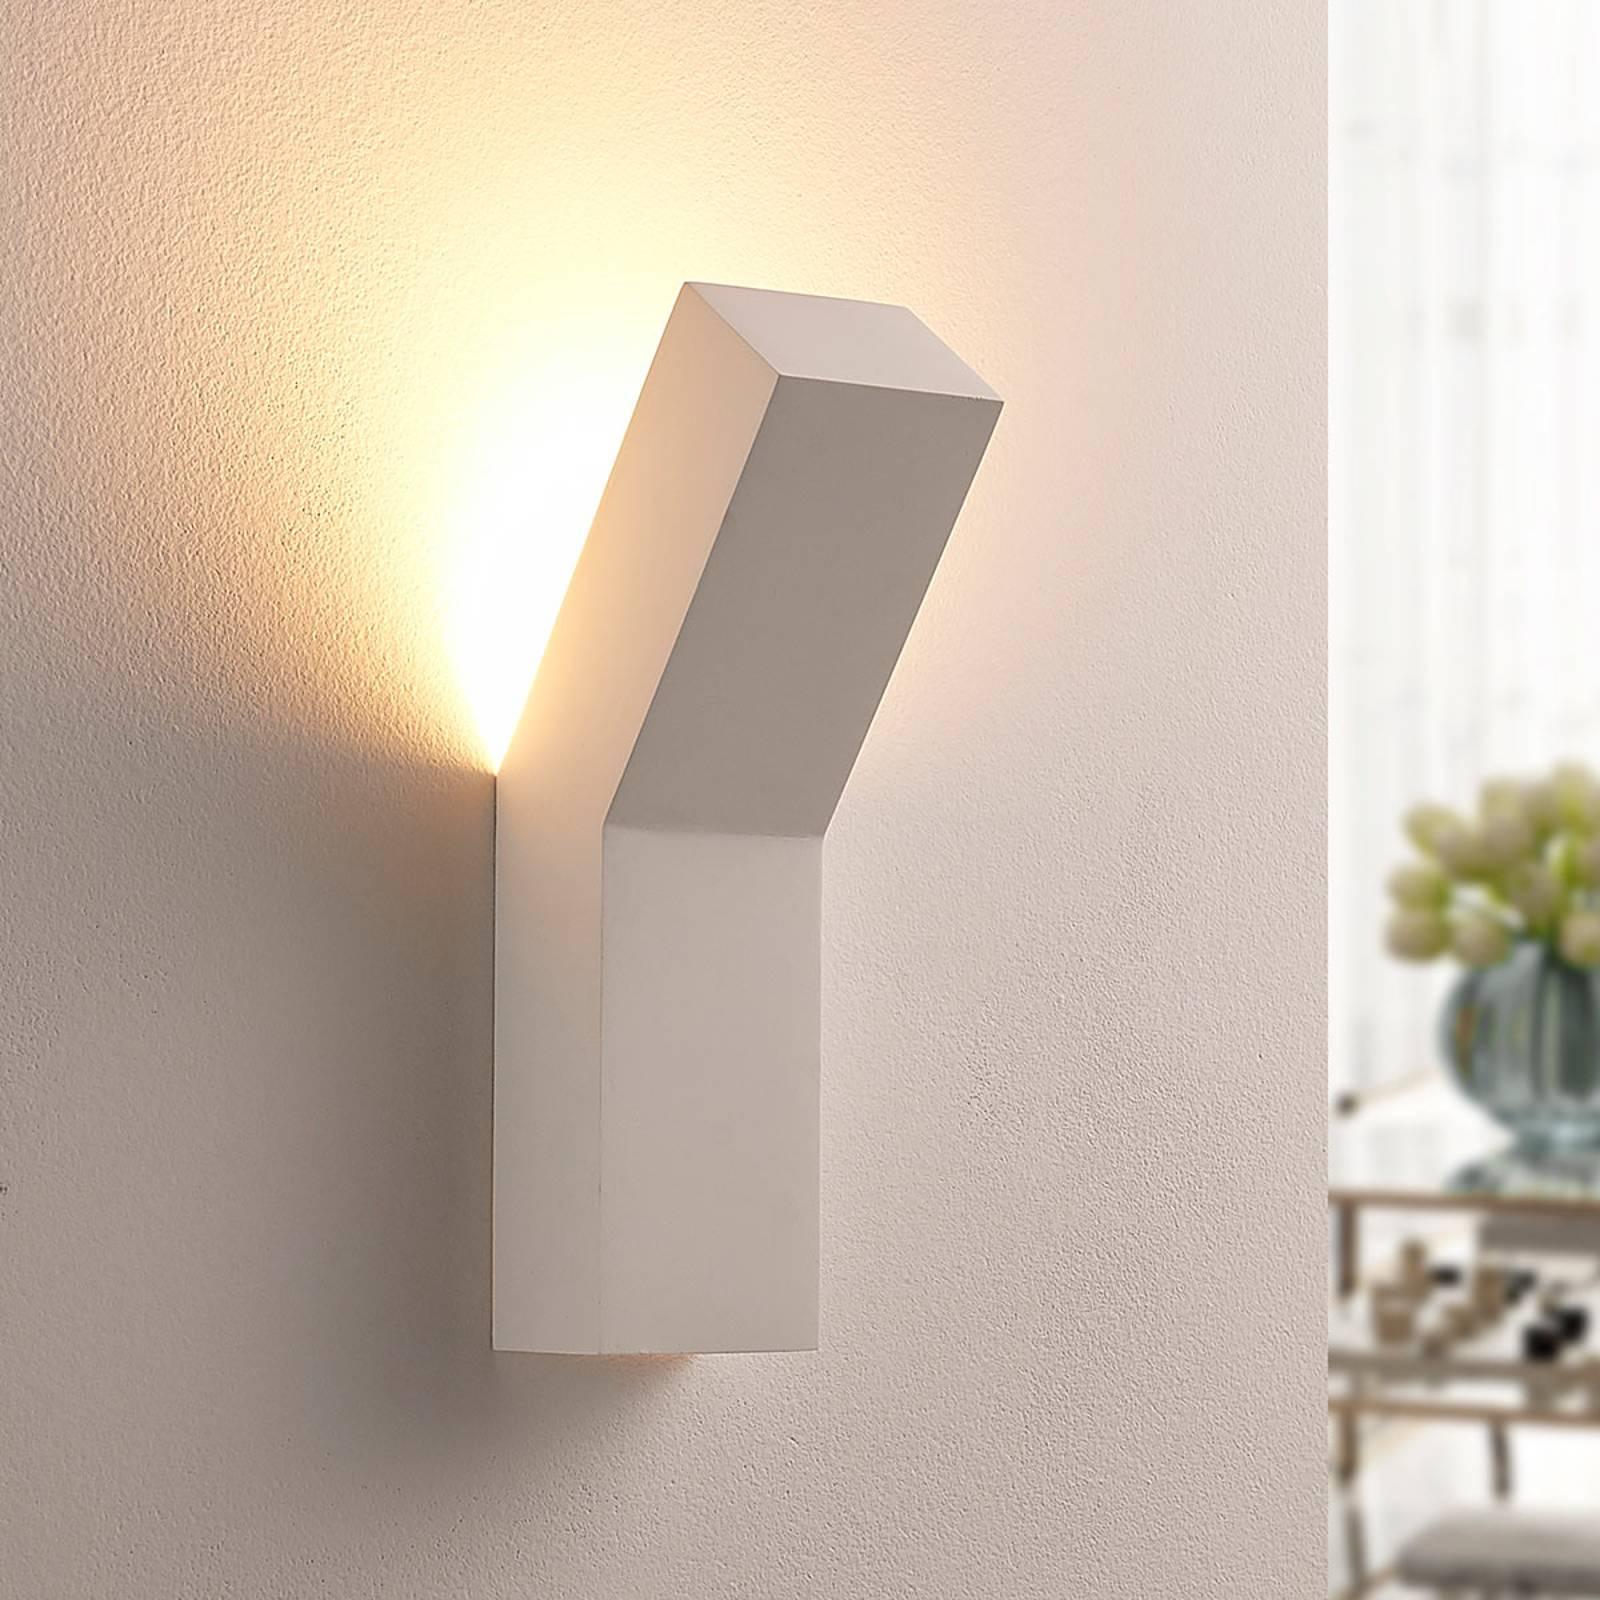 Moderni LED-seinävalonheitin Tida